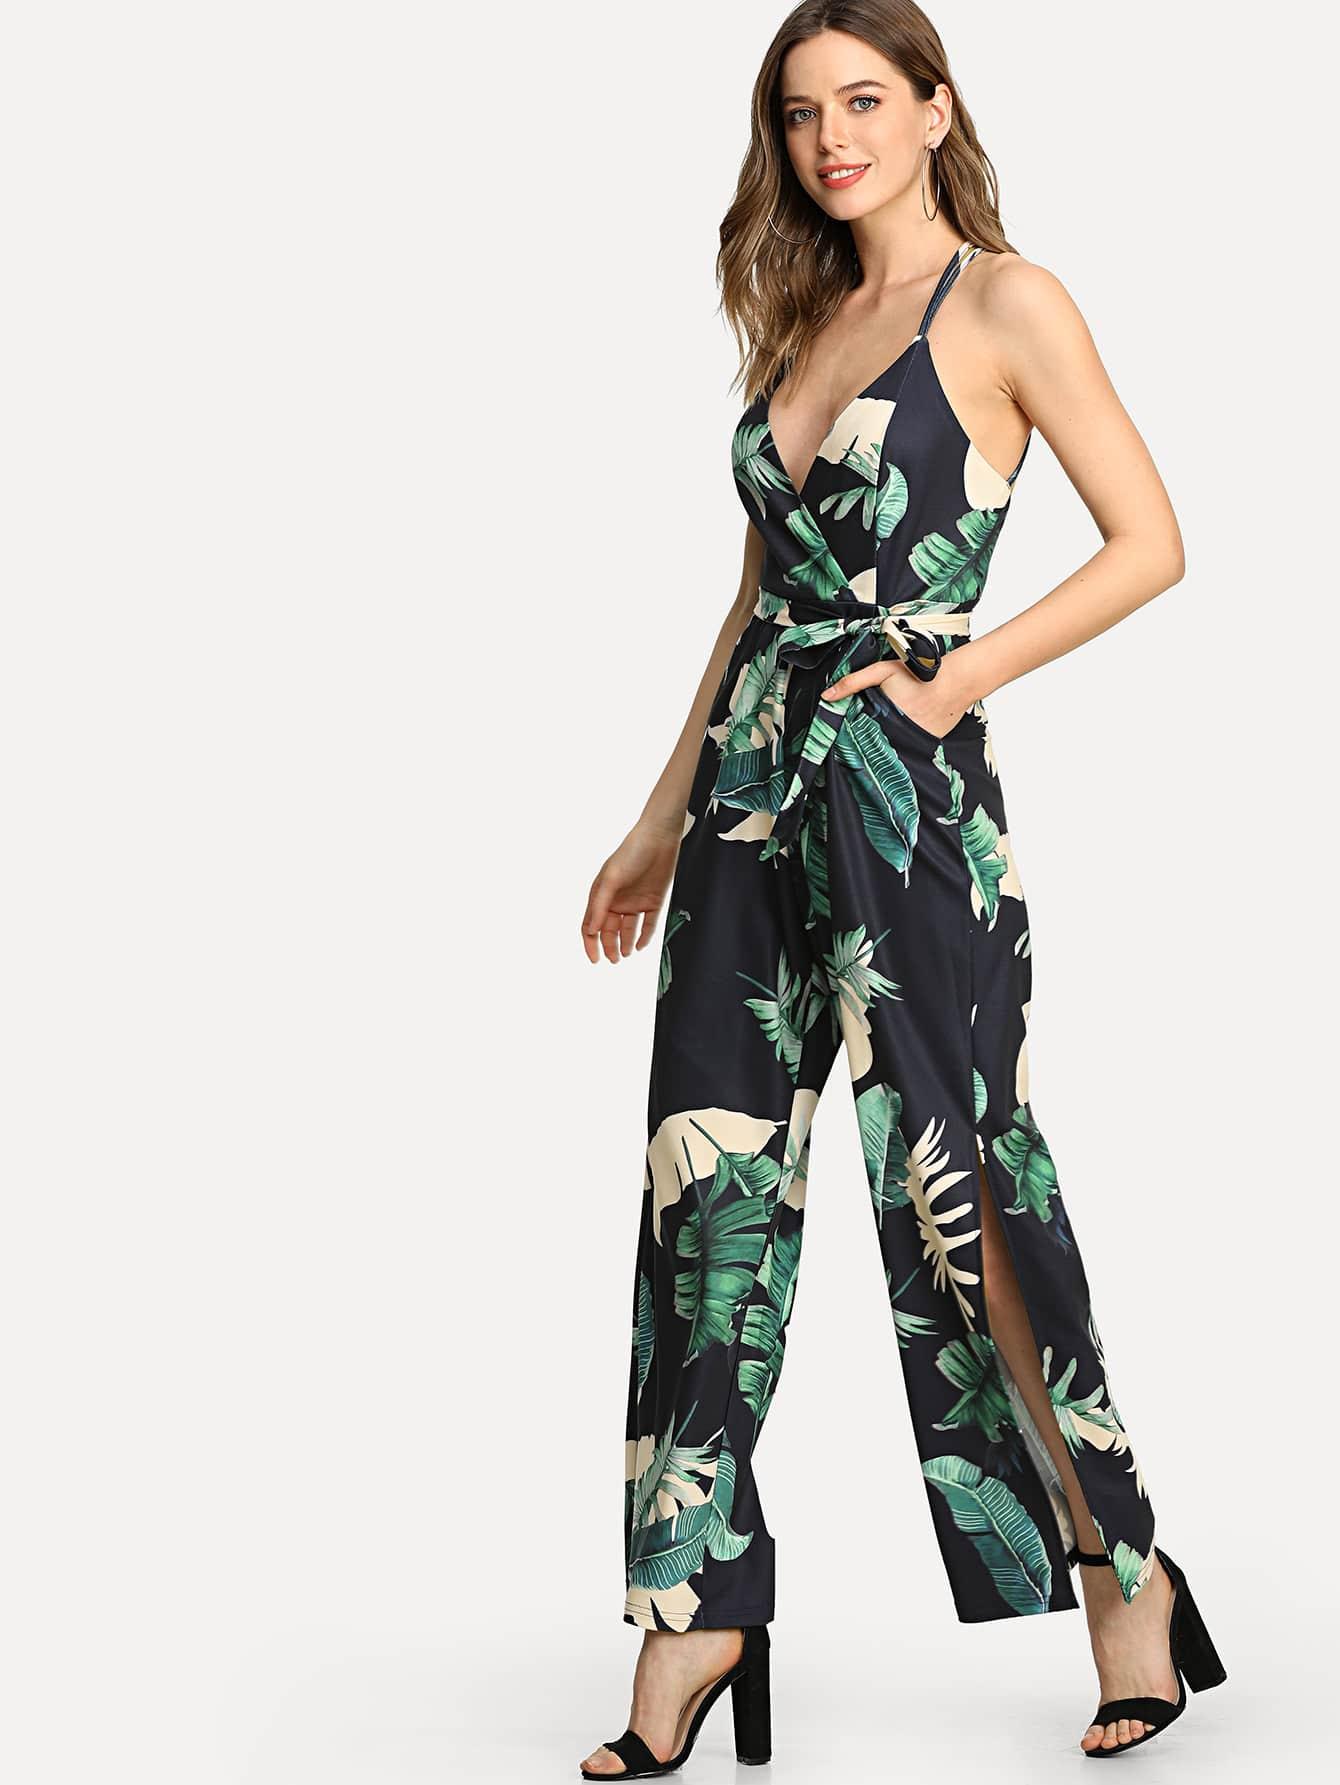 Overlap Front Tropical Cami Jumpsuit drawstring front cutout midriff tropical jumpsuit